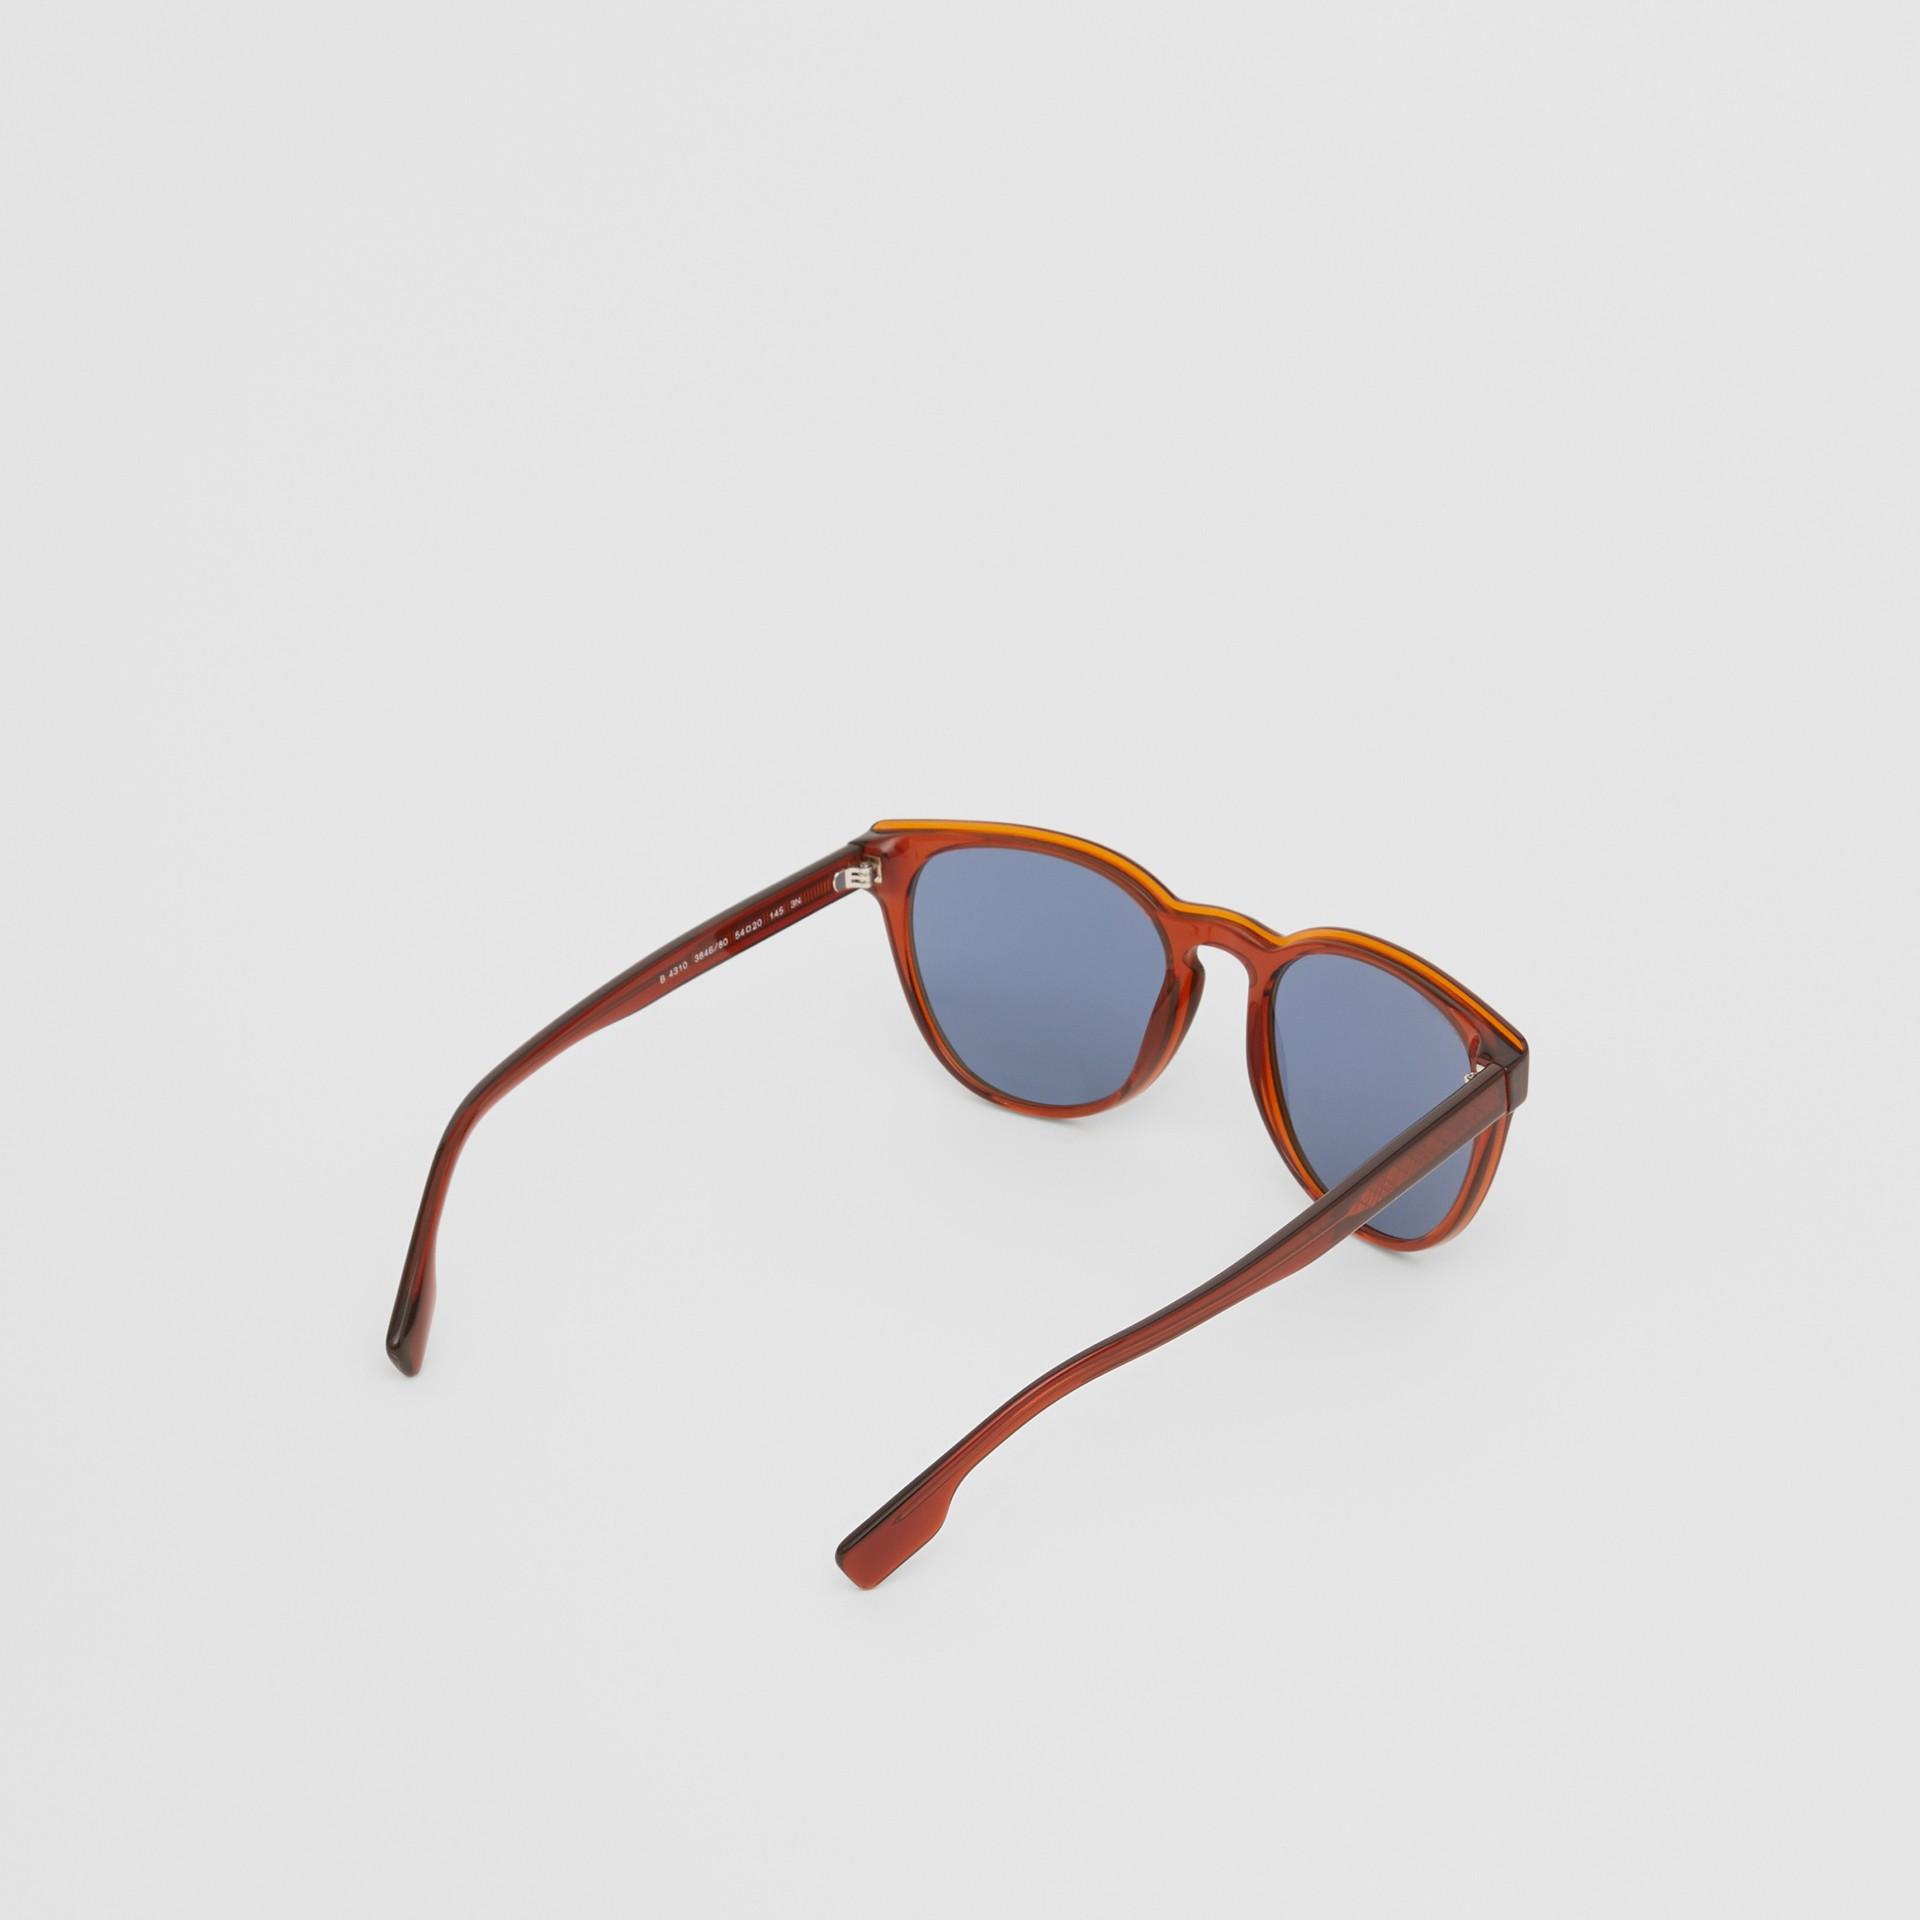 Round Frame Sunglasses in Amber - Men | Burberry Australia - gallery image 3